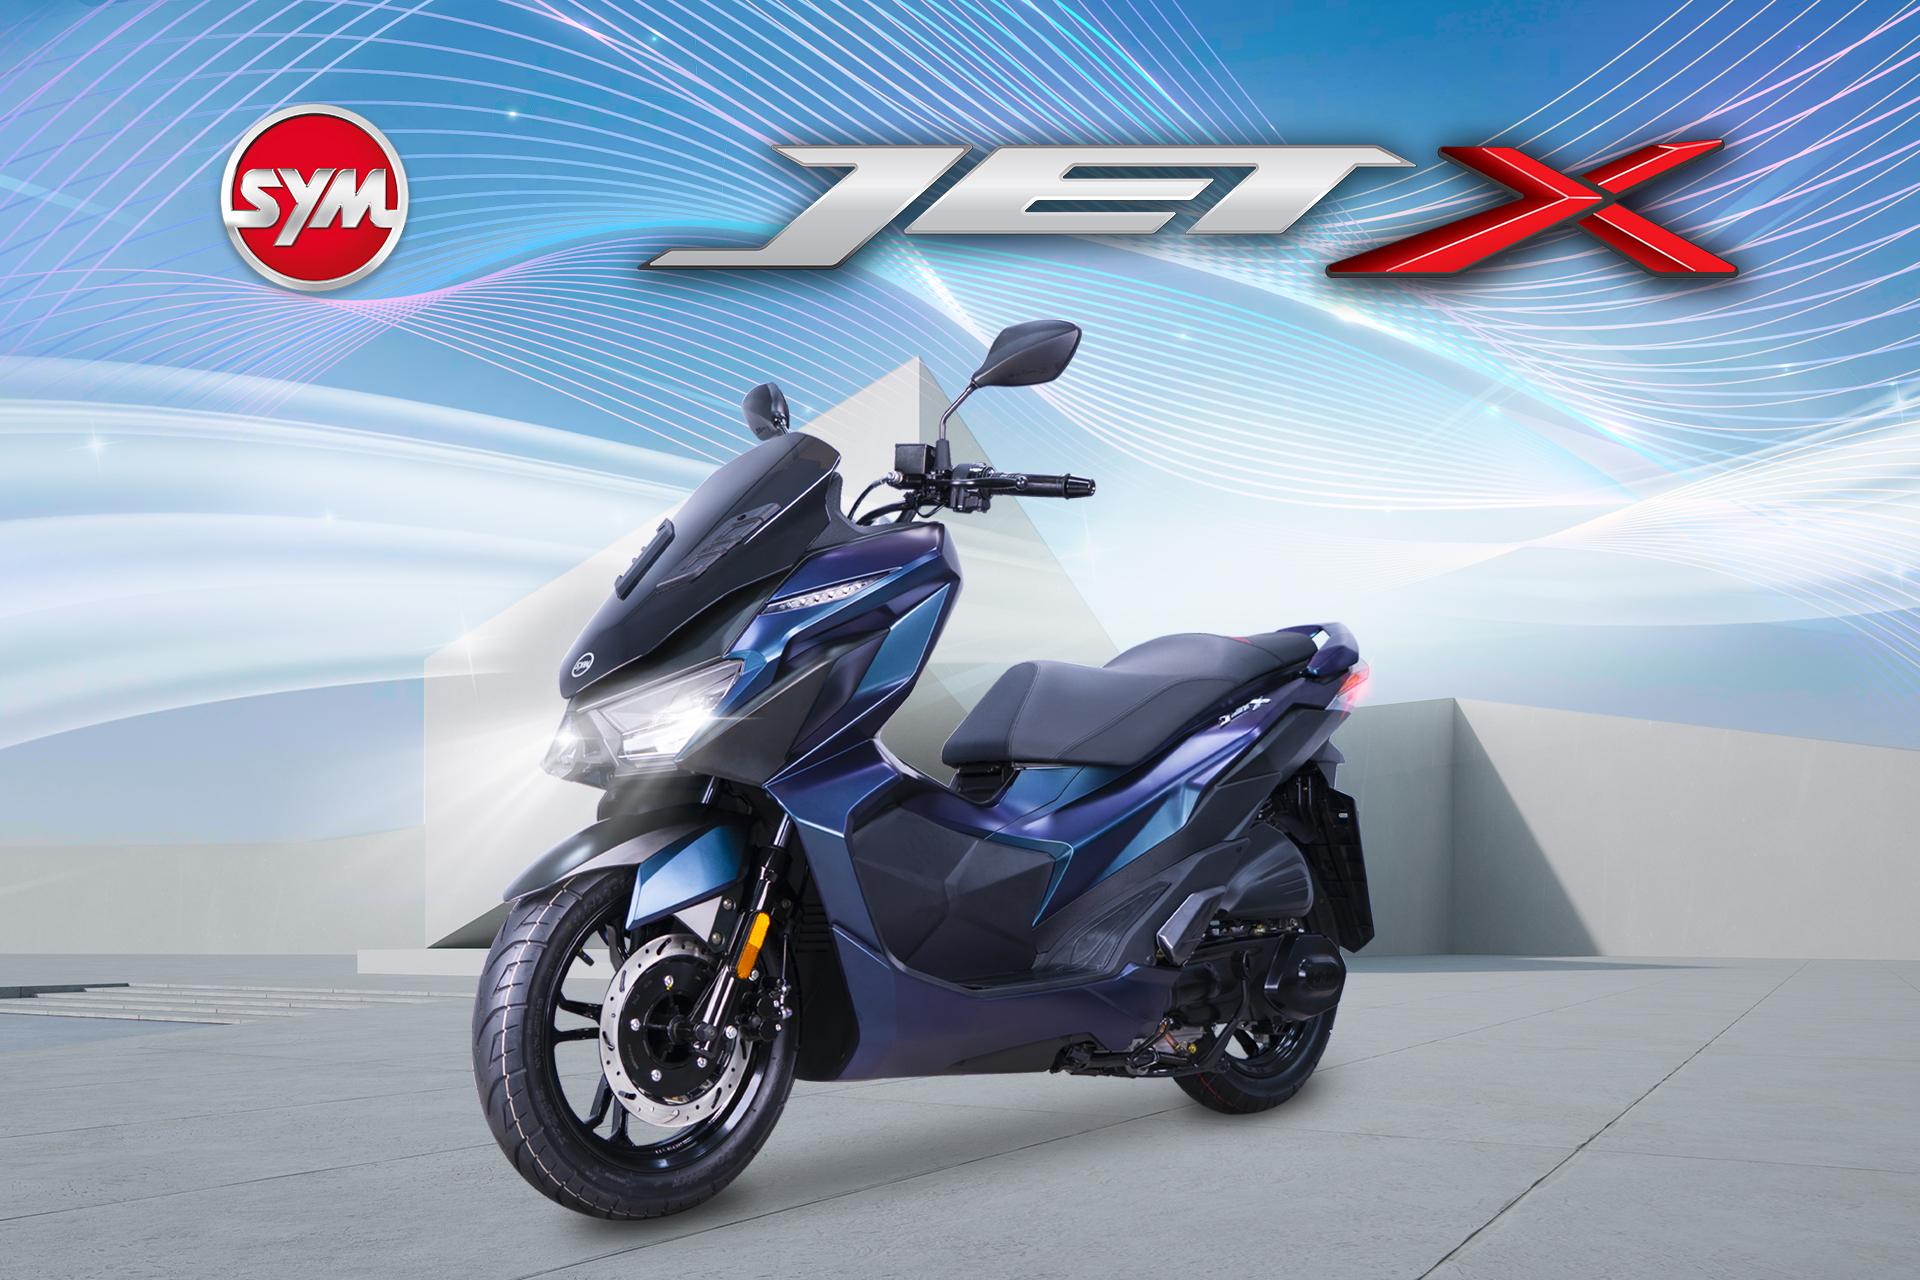 Chi tiết SYM JET 150 2021 Malaysia